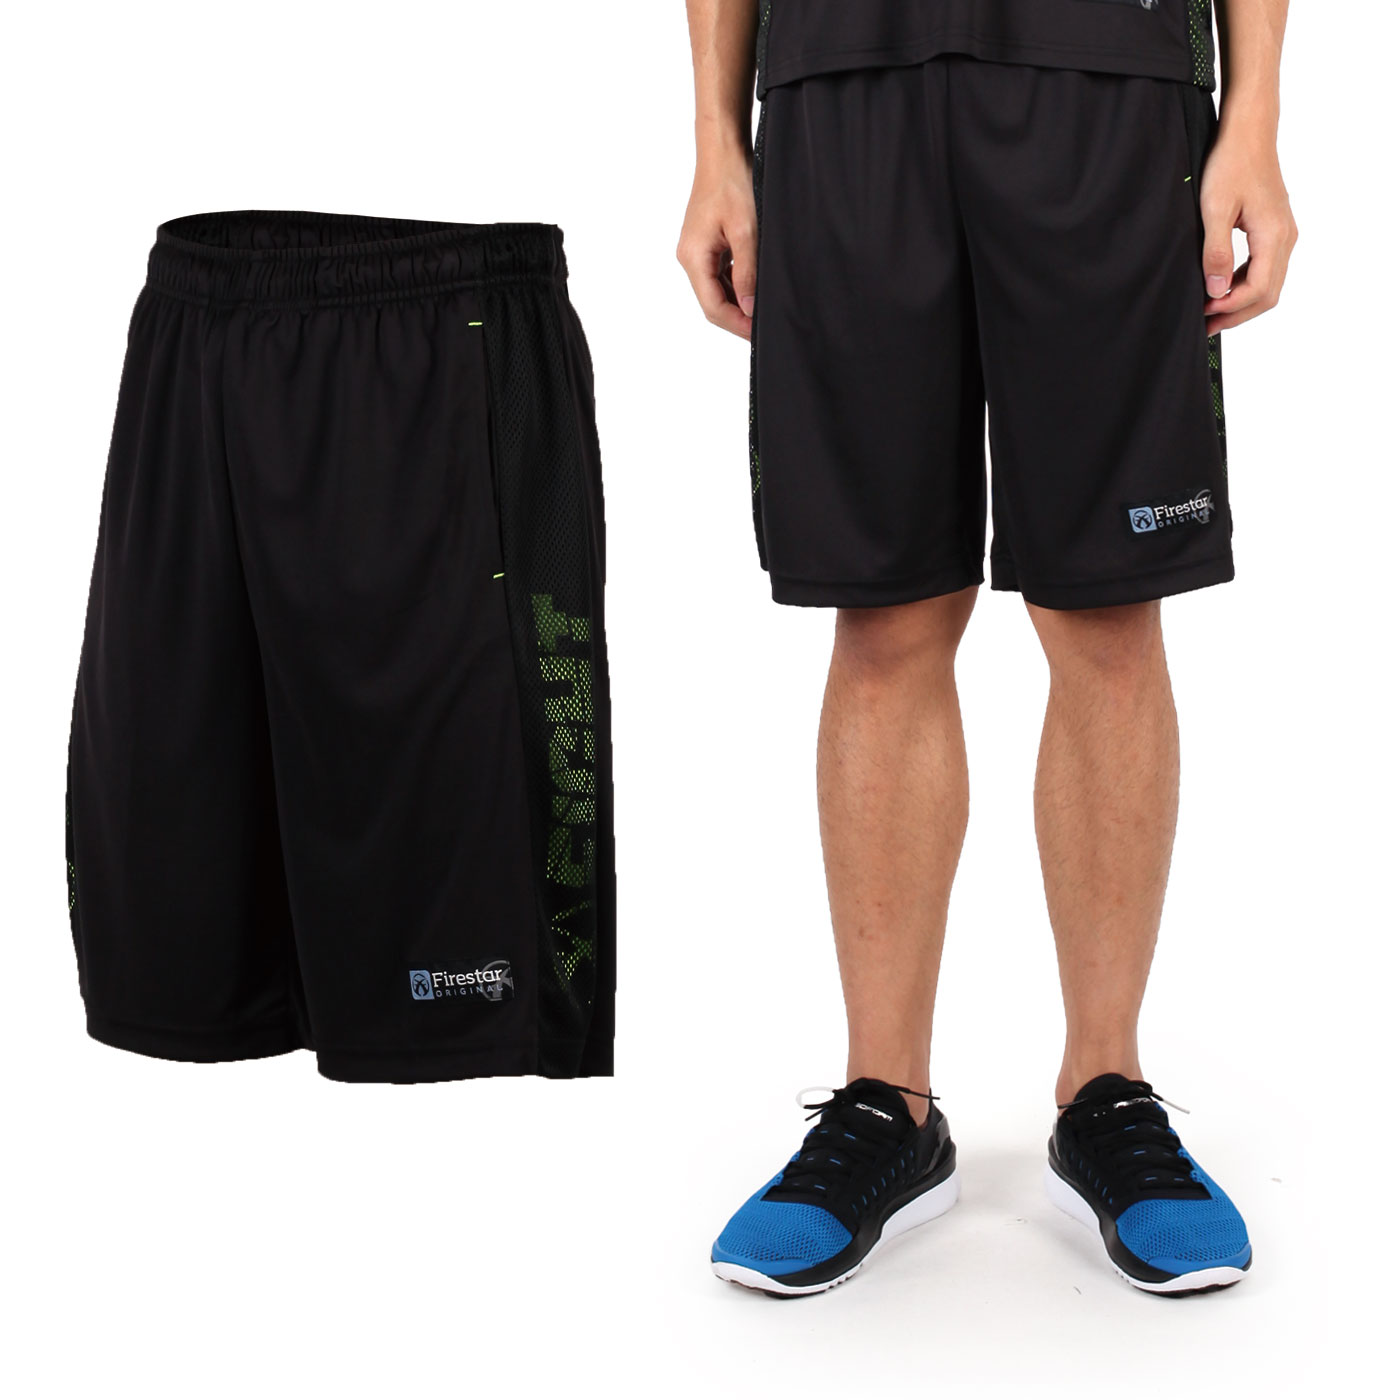 FIRESTAR 吸排籃球褲 B6301-10 - 黑綠